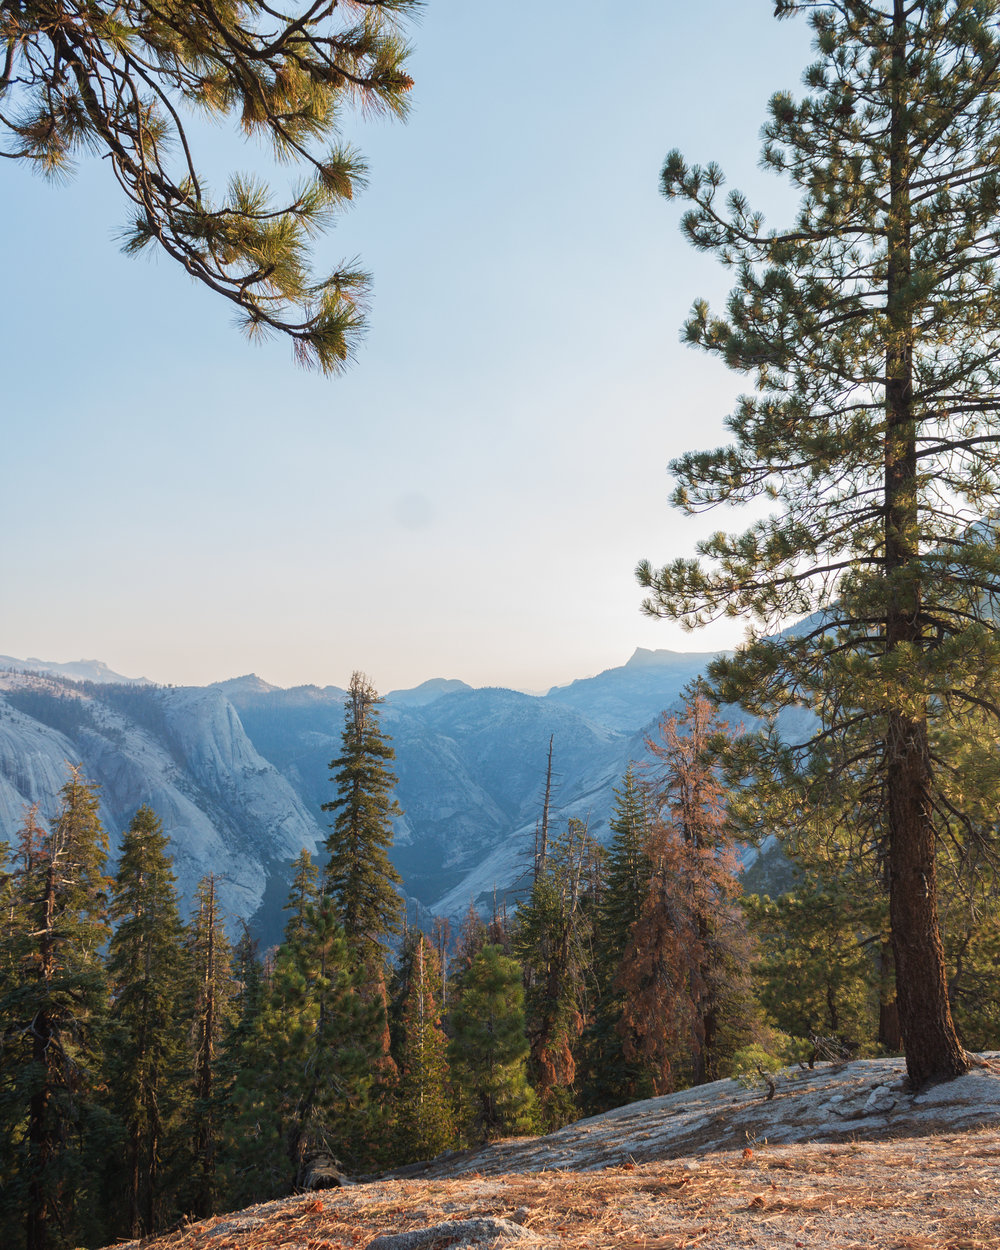 Yosemite National Park viewpoint, California, USA